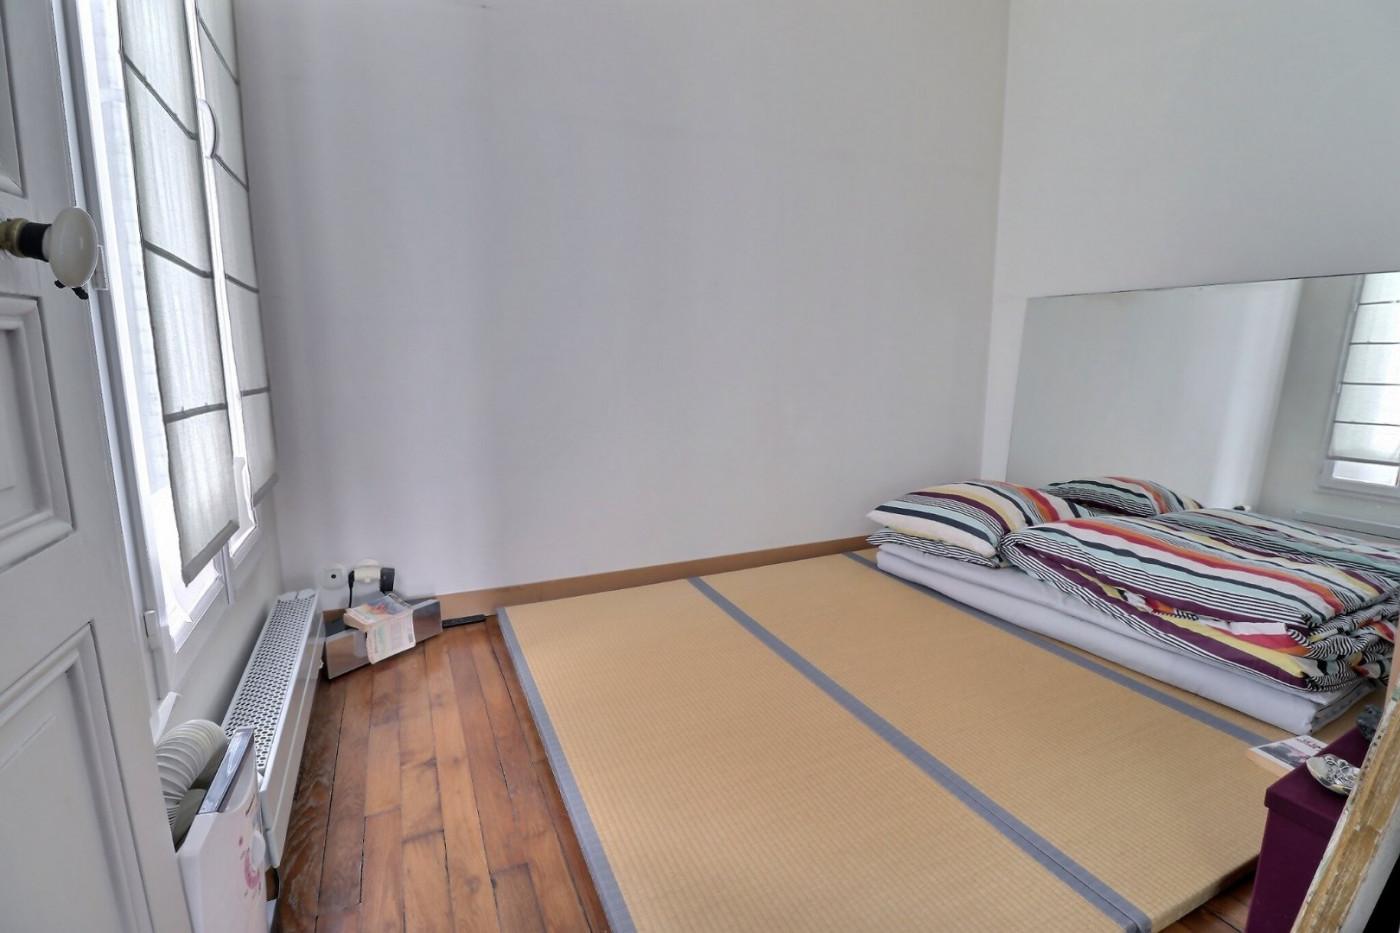 A vendre  Pantin | Réf 93005535 - Grand paris immo transaction